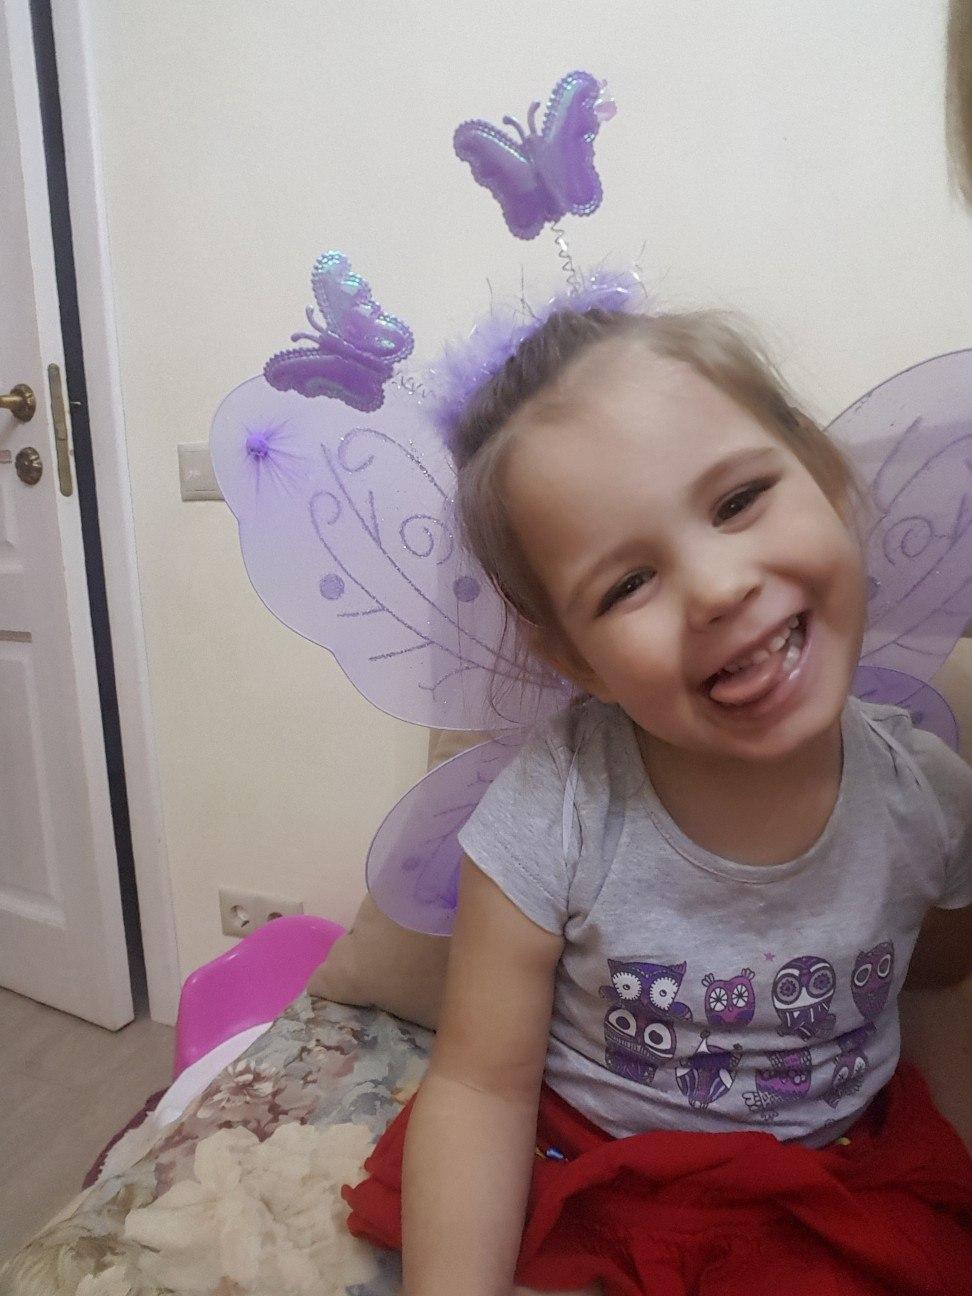 Фея бабочка. Принцесса собирается на бал